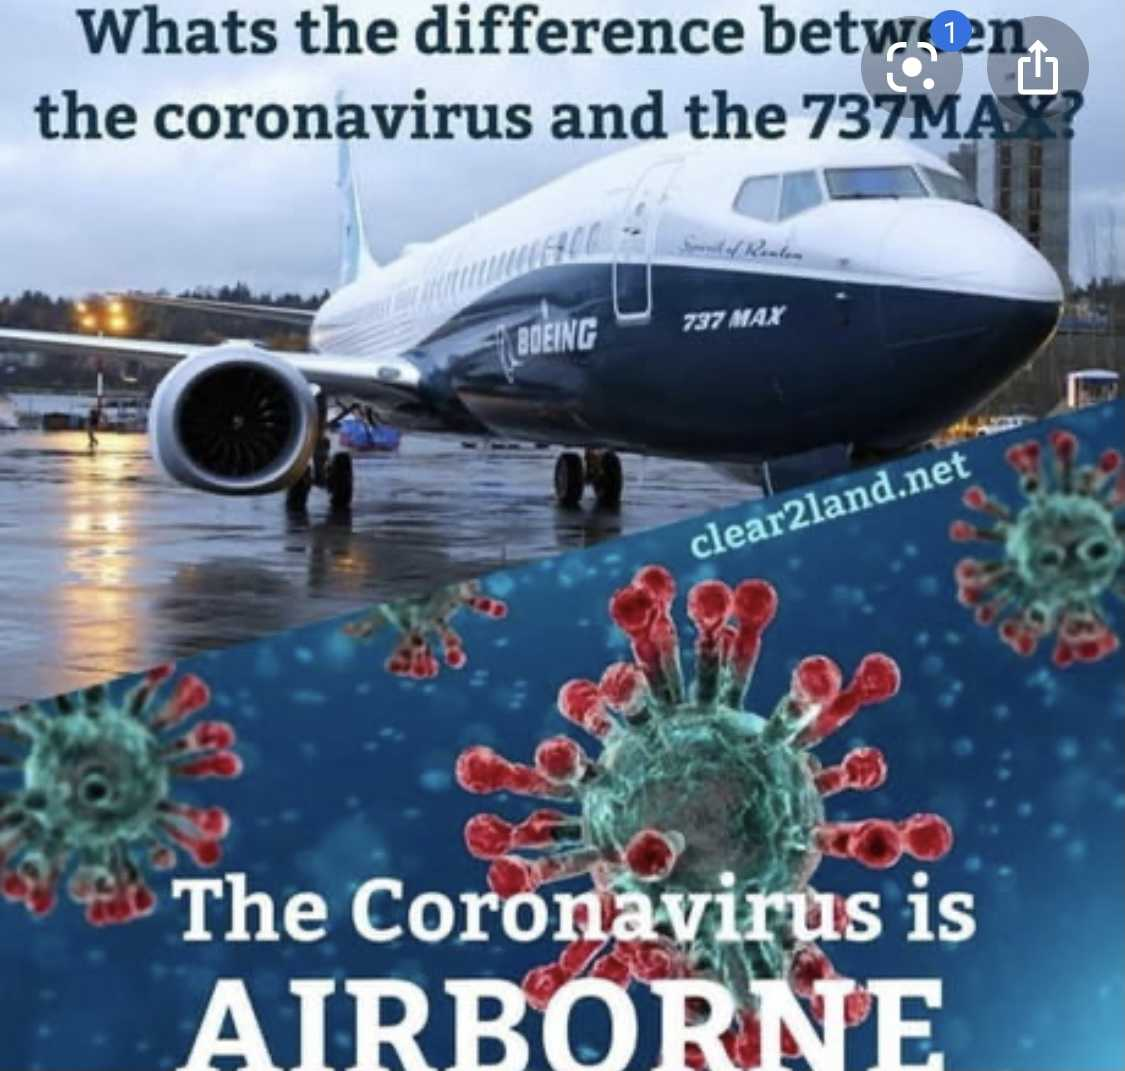 funny 737 max memes - covid vs 737max